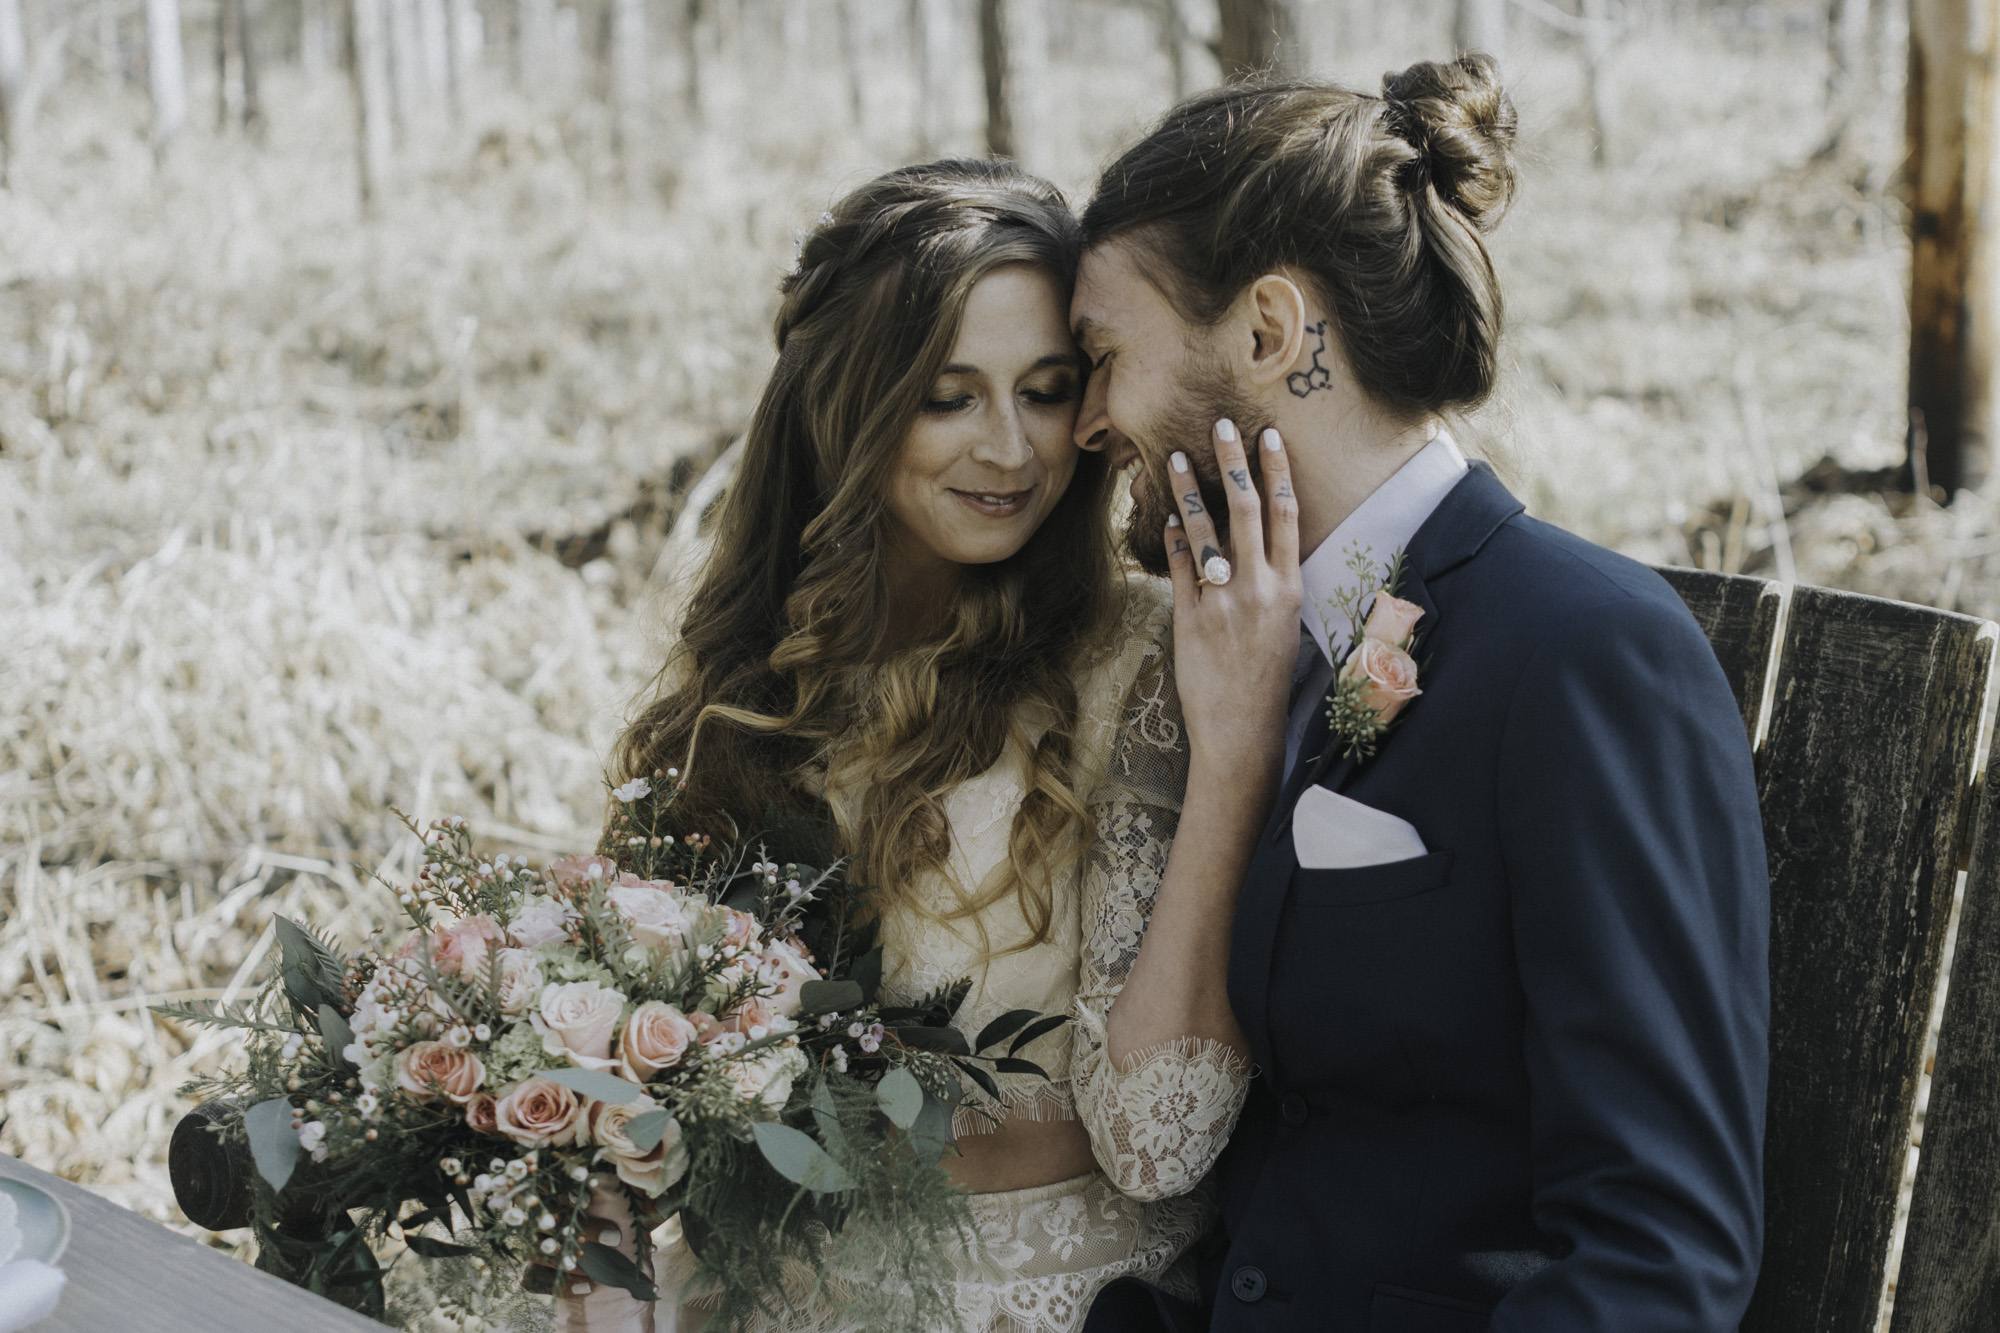 Cate_Ann_Photography_Dayton_Ohio_Wedding_Elopement_And_Engagement_PhotographerDSC_5748.jpg